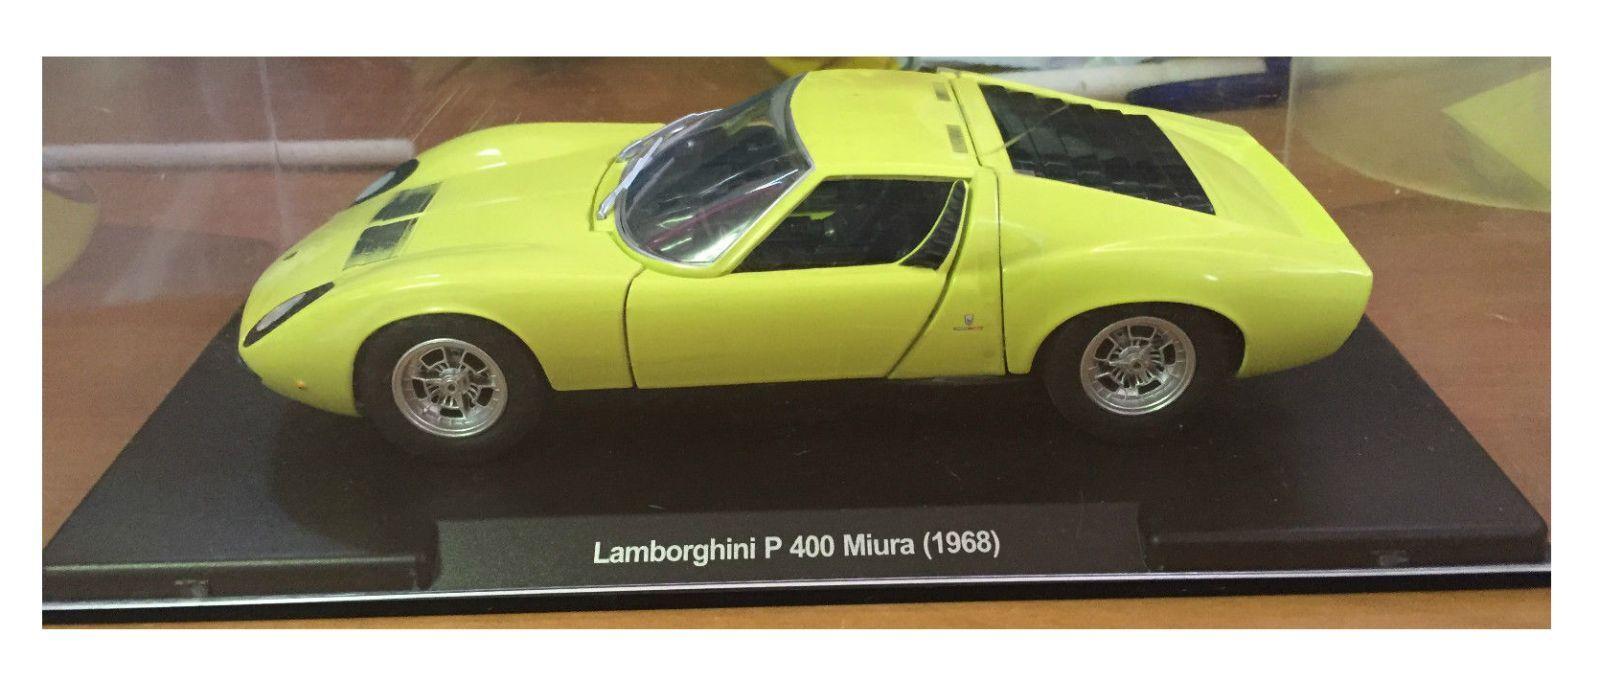 Lamborghini P 400 Miura 1968 1 24 scale